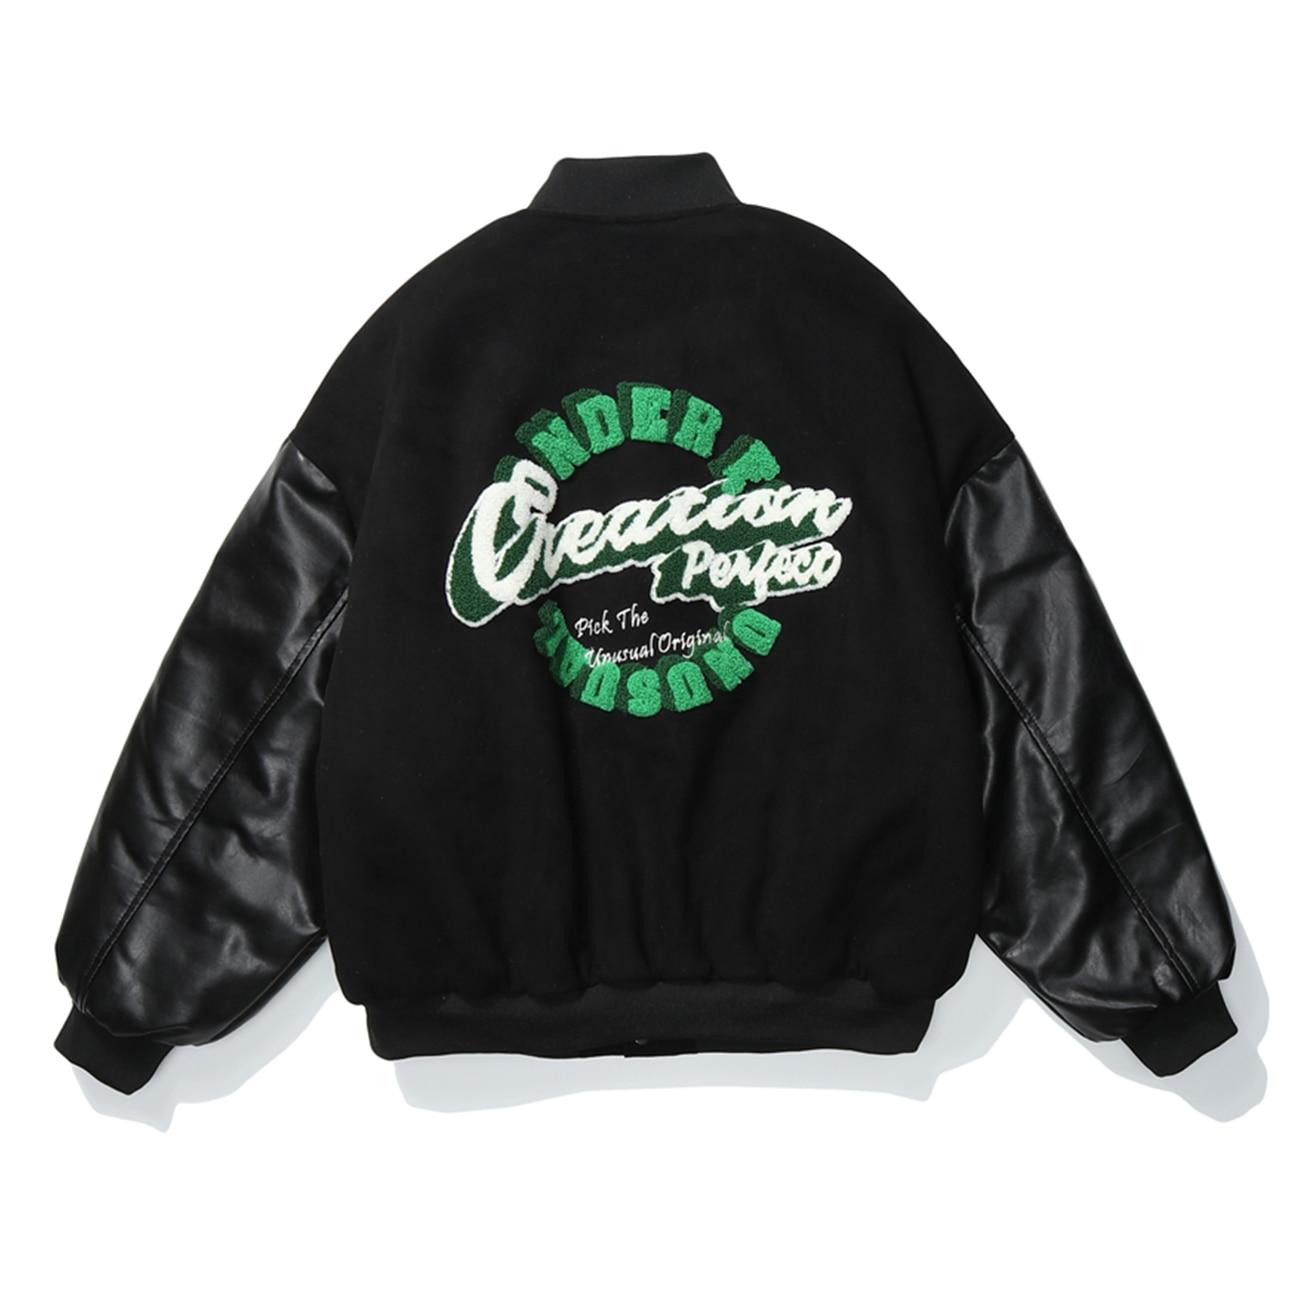 LACIBLE Mens Hip Hop Chamois Suede Thick Jackets Streetwear Baseball Jacket Coats Winter Harajuku Patchwork Bomber Jacket Tops